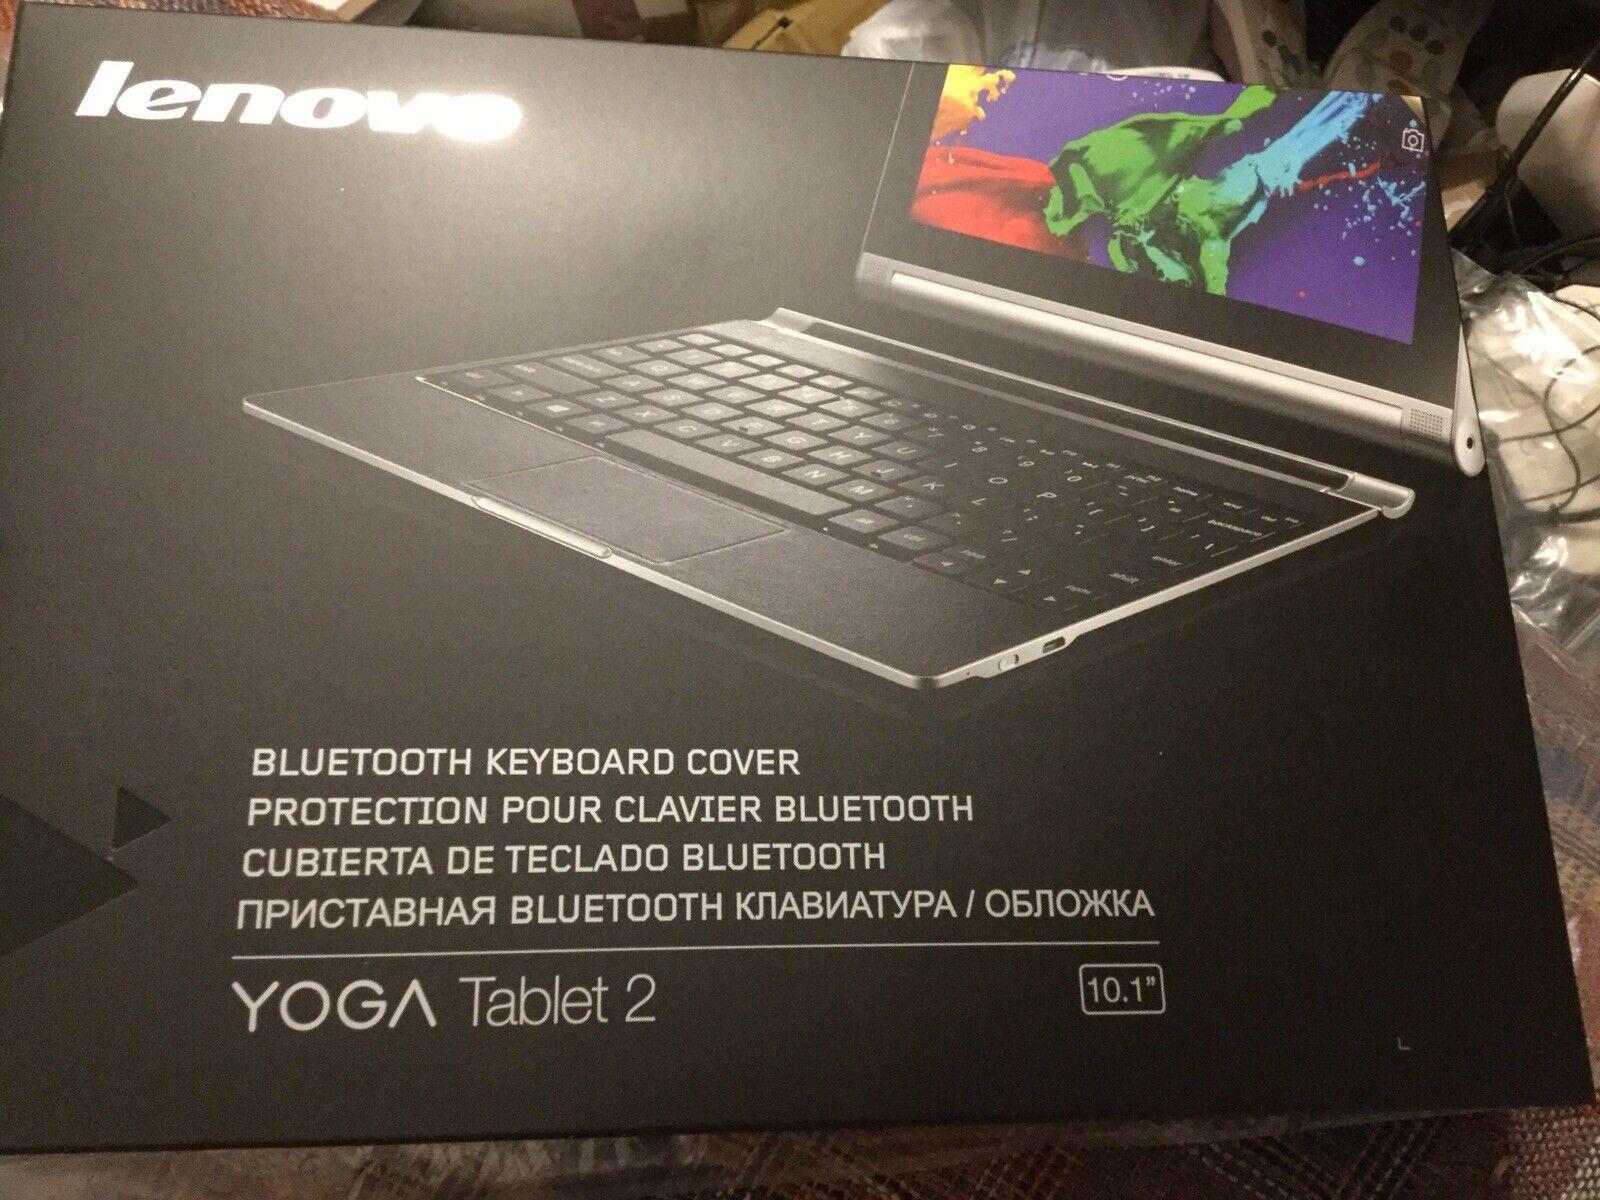 Lenovo Yoga Tablet 2 Bluetooth Keyboard BKC800 Zg38c00209